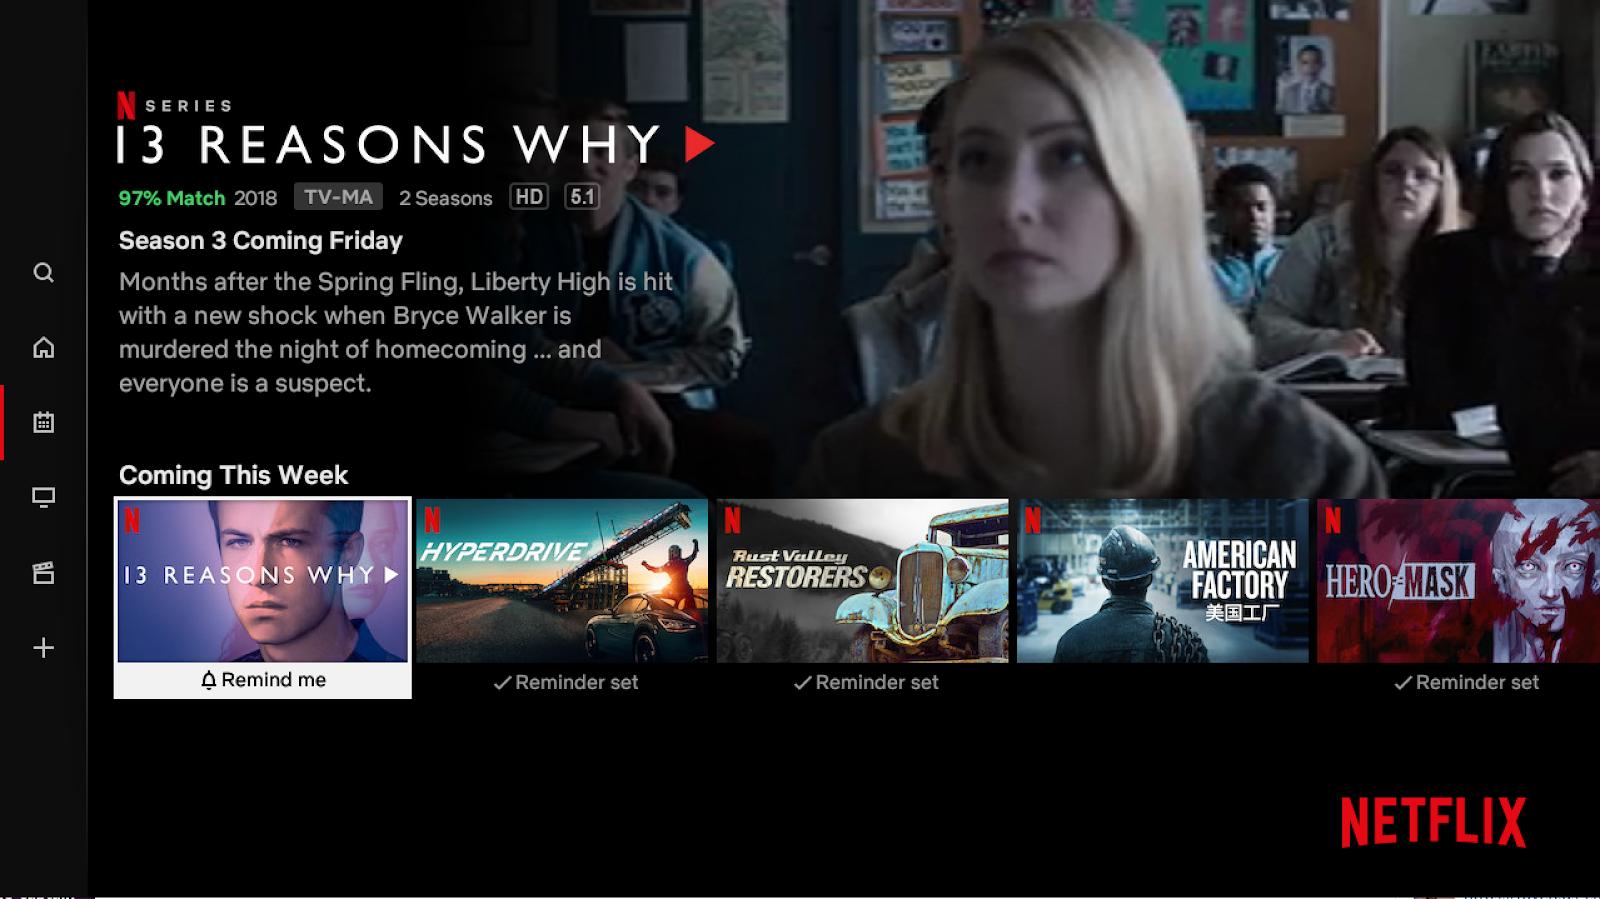 Netflix In arrivo questa settimana